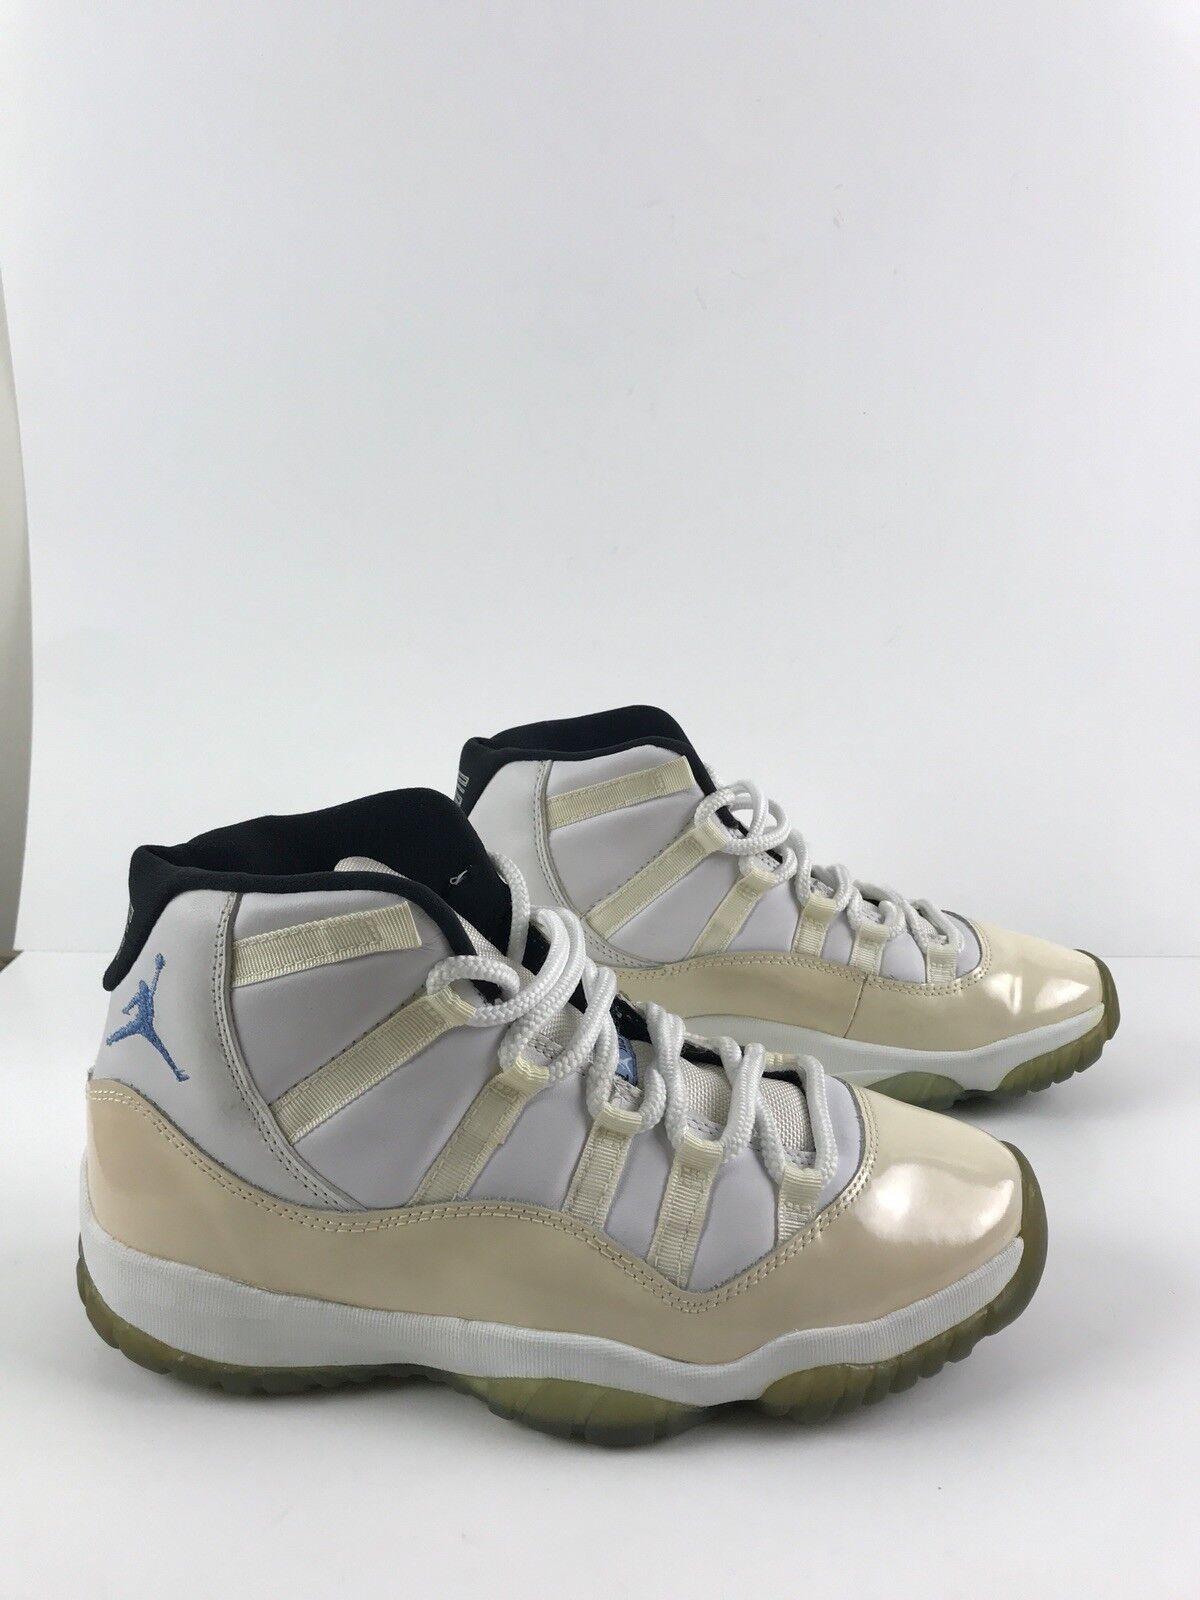 e5fe7c525c5 1996 Nike Air Jordan XI 11 Columbia Vintage 130245-141 DS nunca usado  130245-141 Vintage tamaño 9